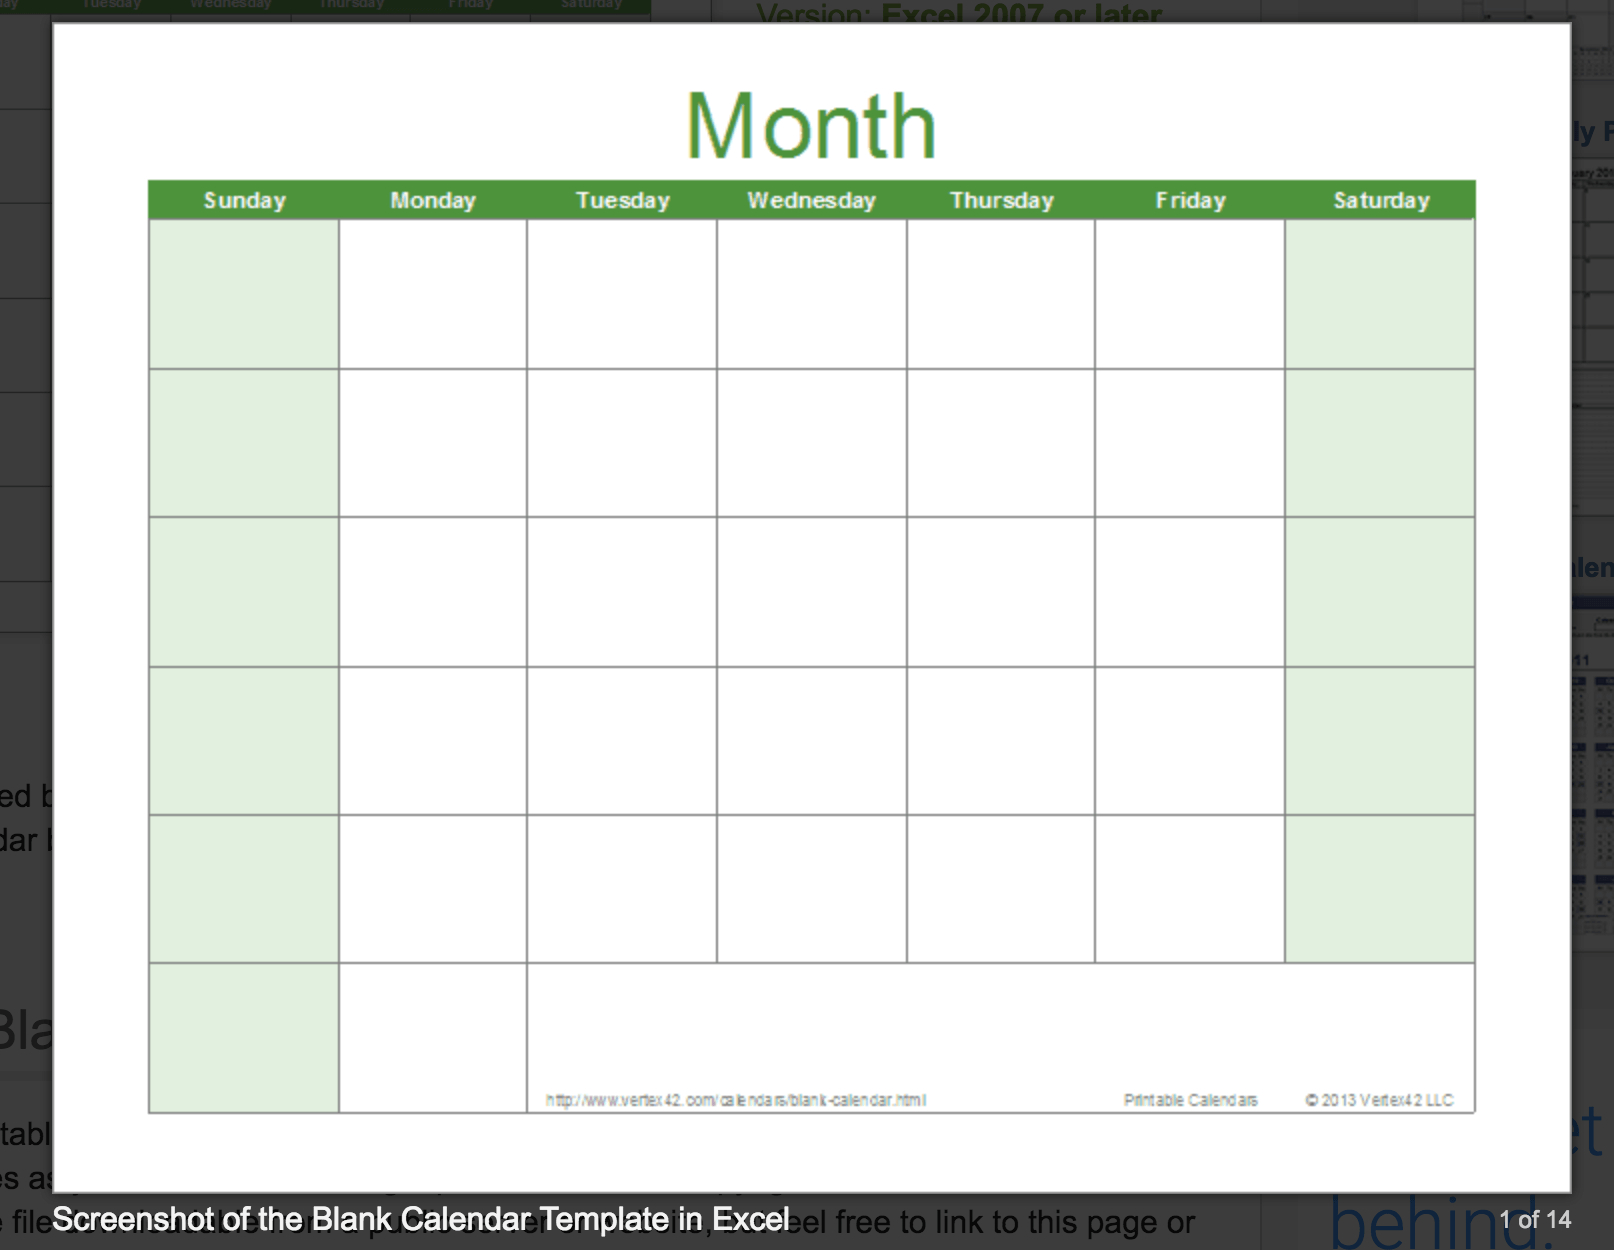 013 Free Excel Calendar Template Vertex42 Blank Unbelievable in Vertex Calendar 2020